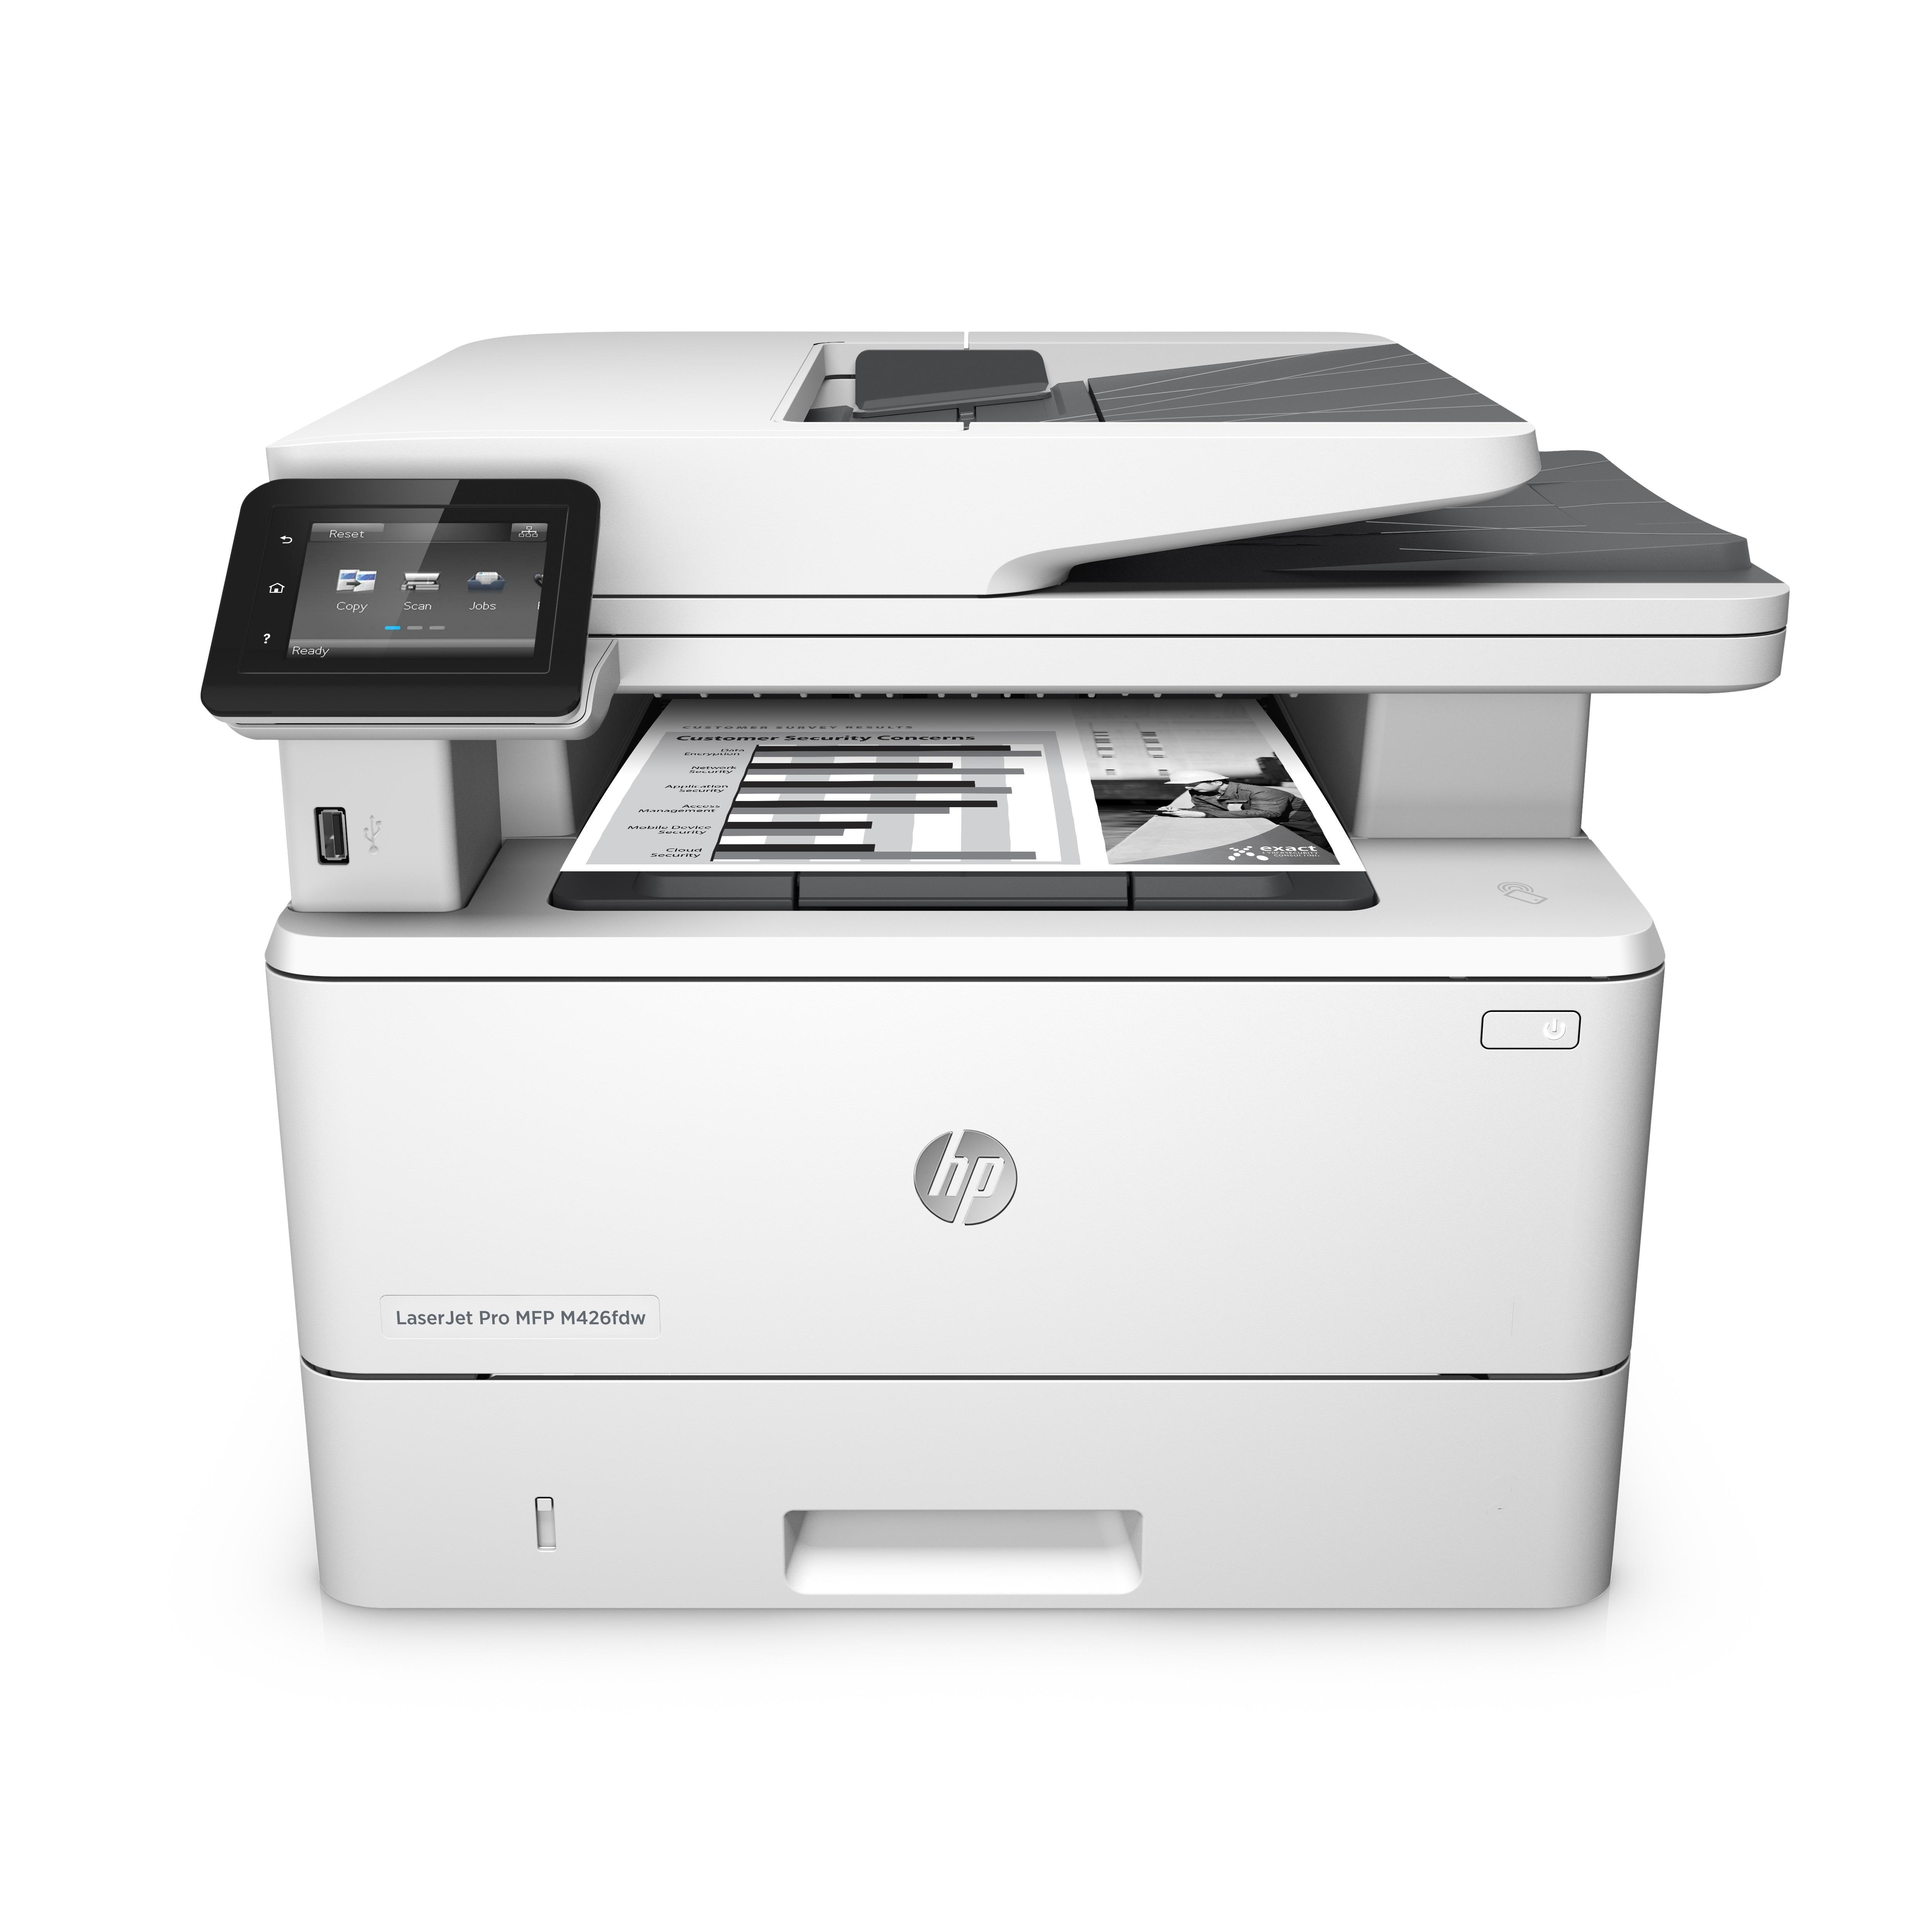 HP LaserJet Pro Pro MFP M426dw Laser A4 Wi-Fi Grey